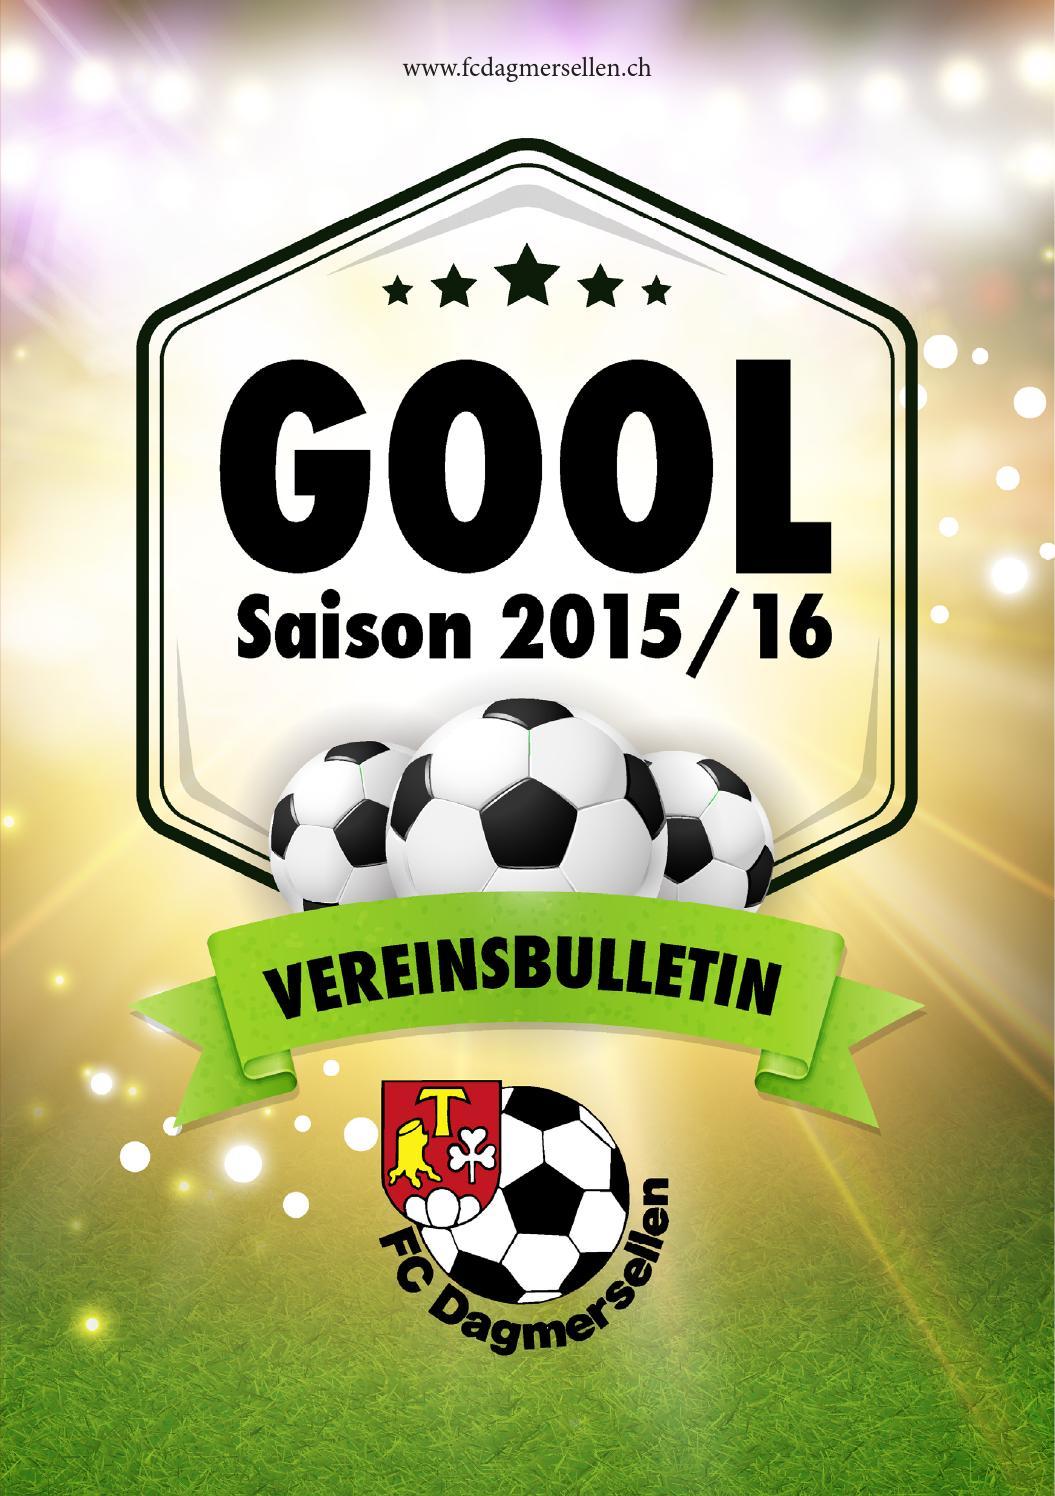 Gool Vereinsbulletin Fc Dagmersellen 2015/2016 By Jonas Tanner - Issuu